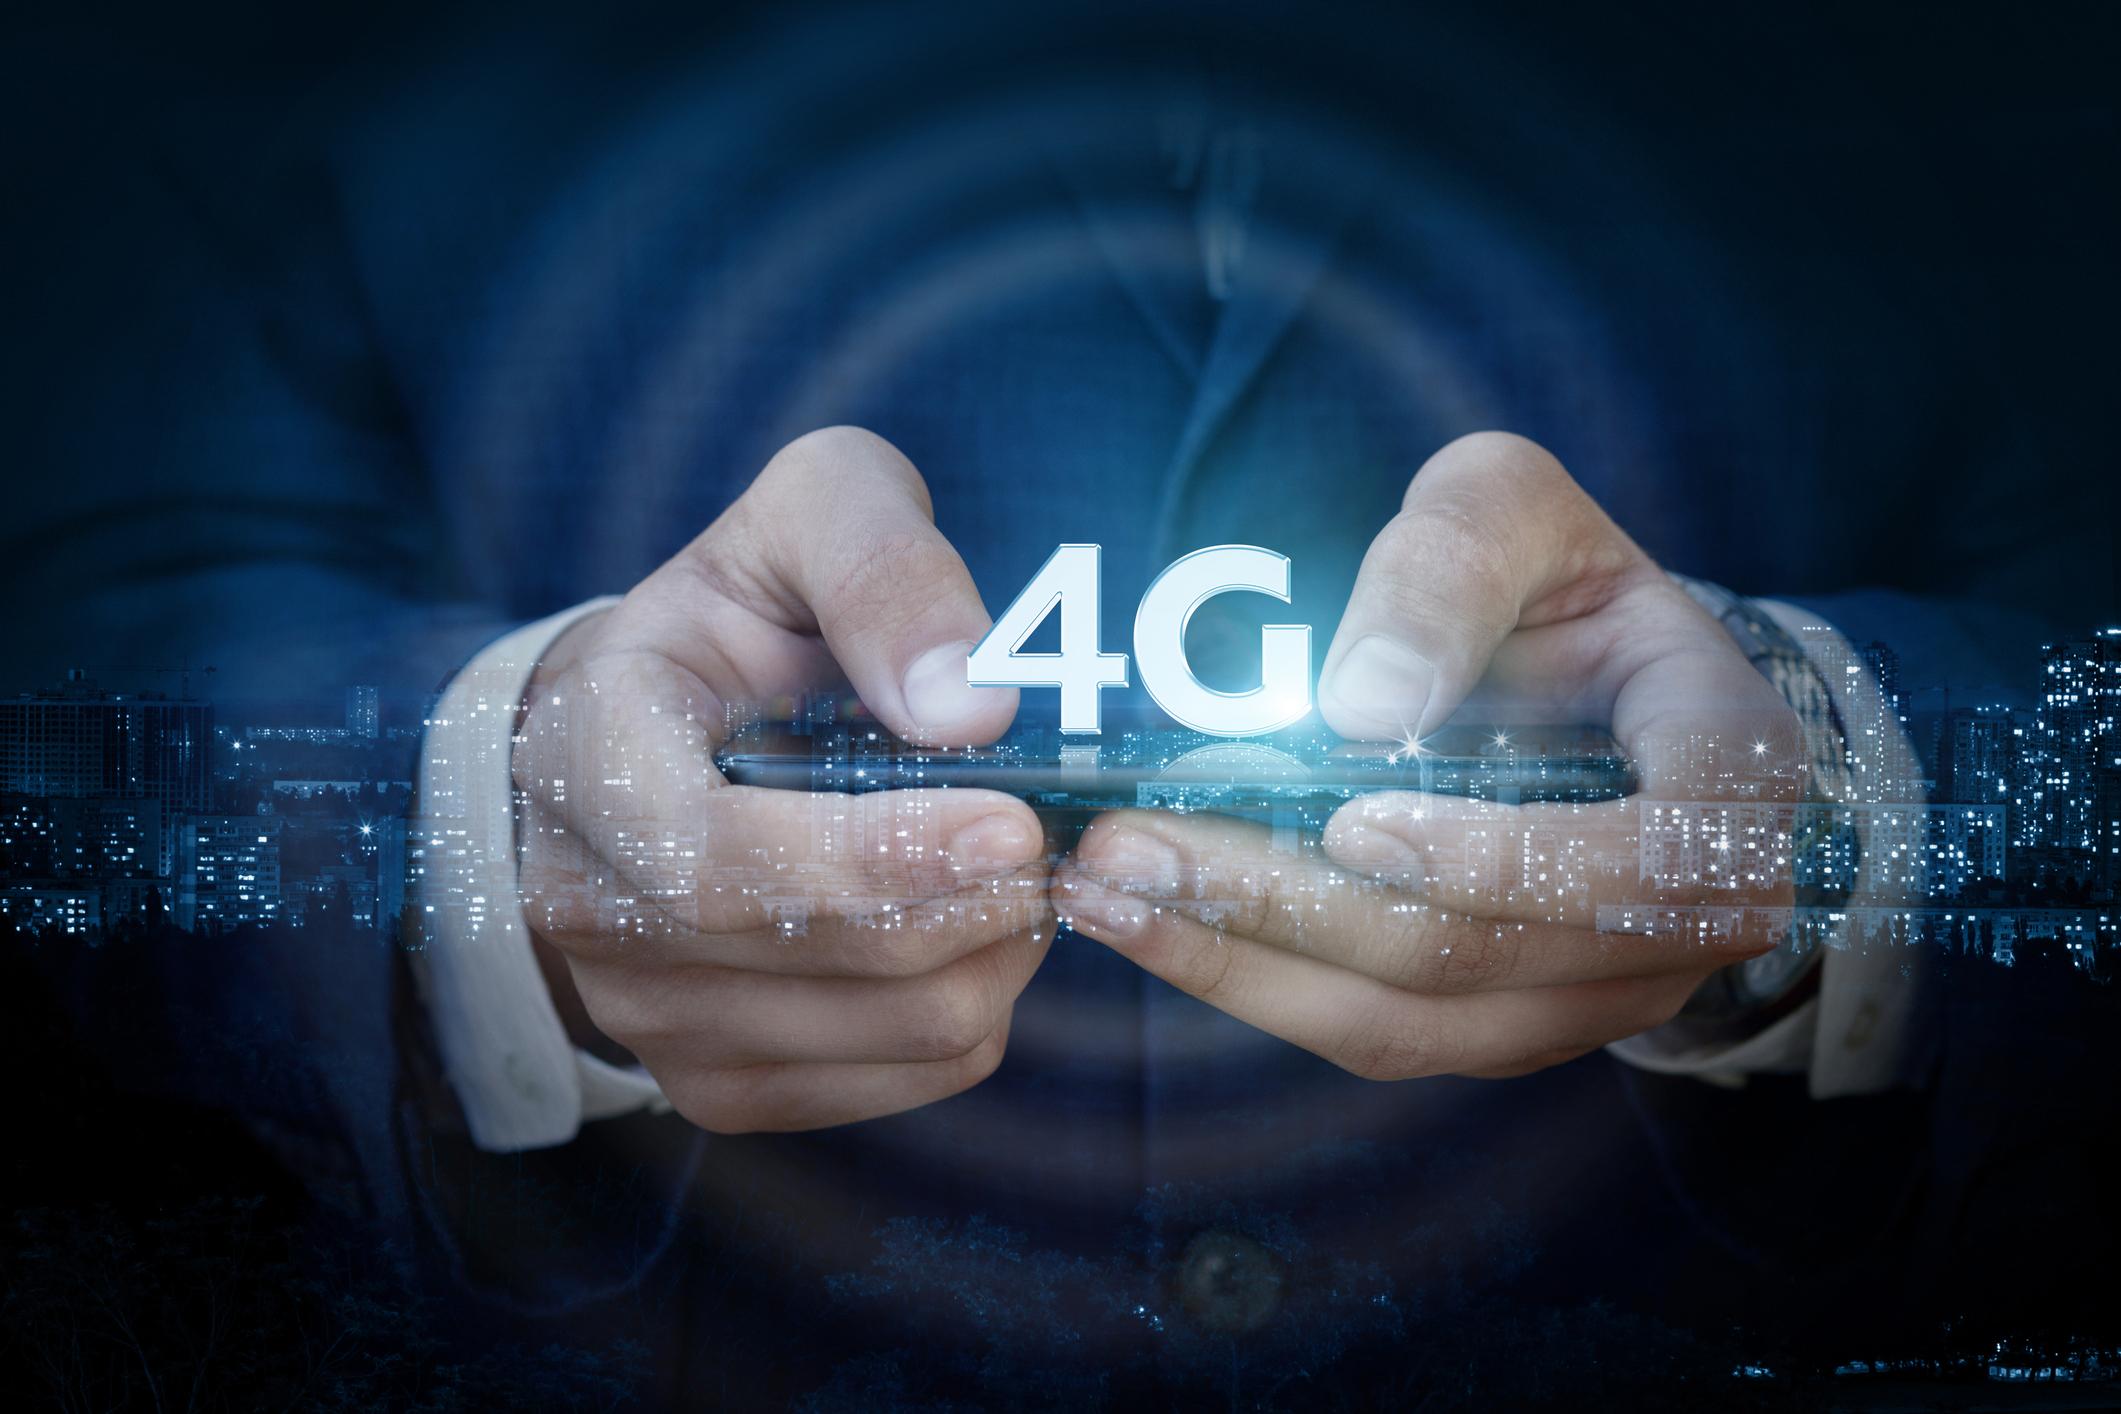 Vodafone, ITU lead initiative to bridge smartphone gap and connect 3.4B people